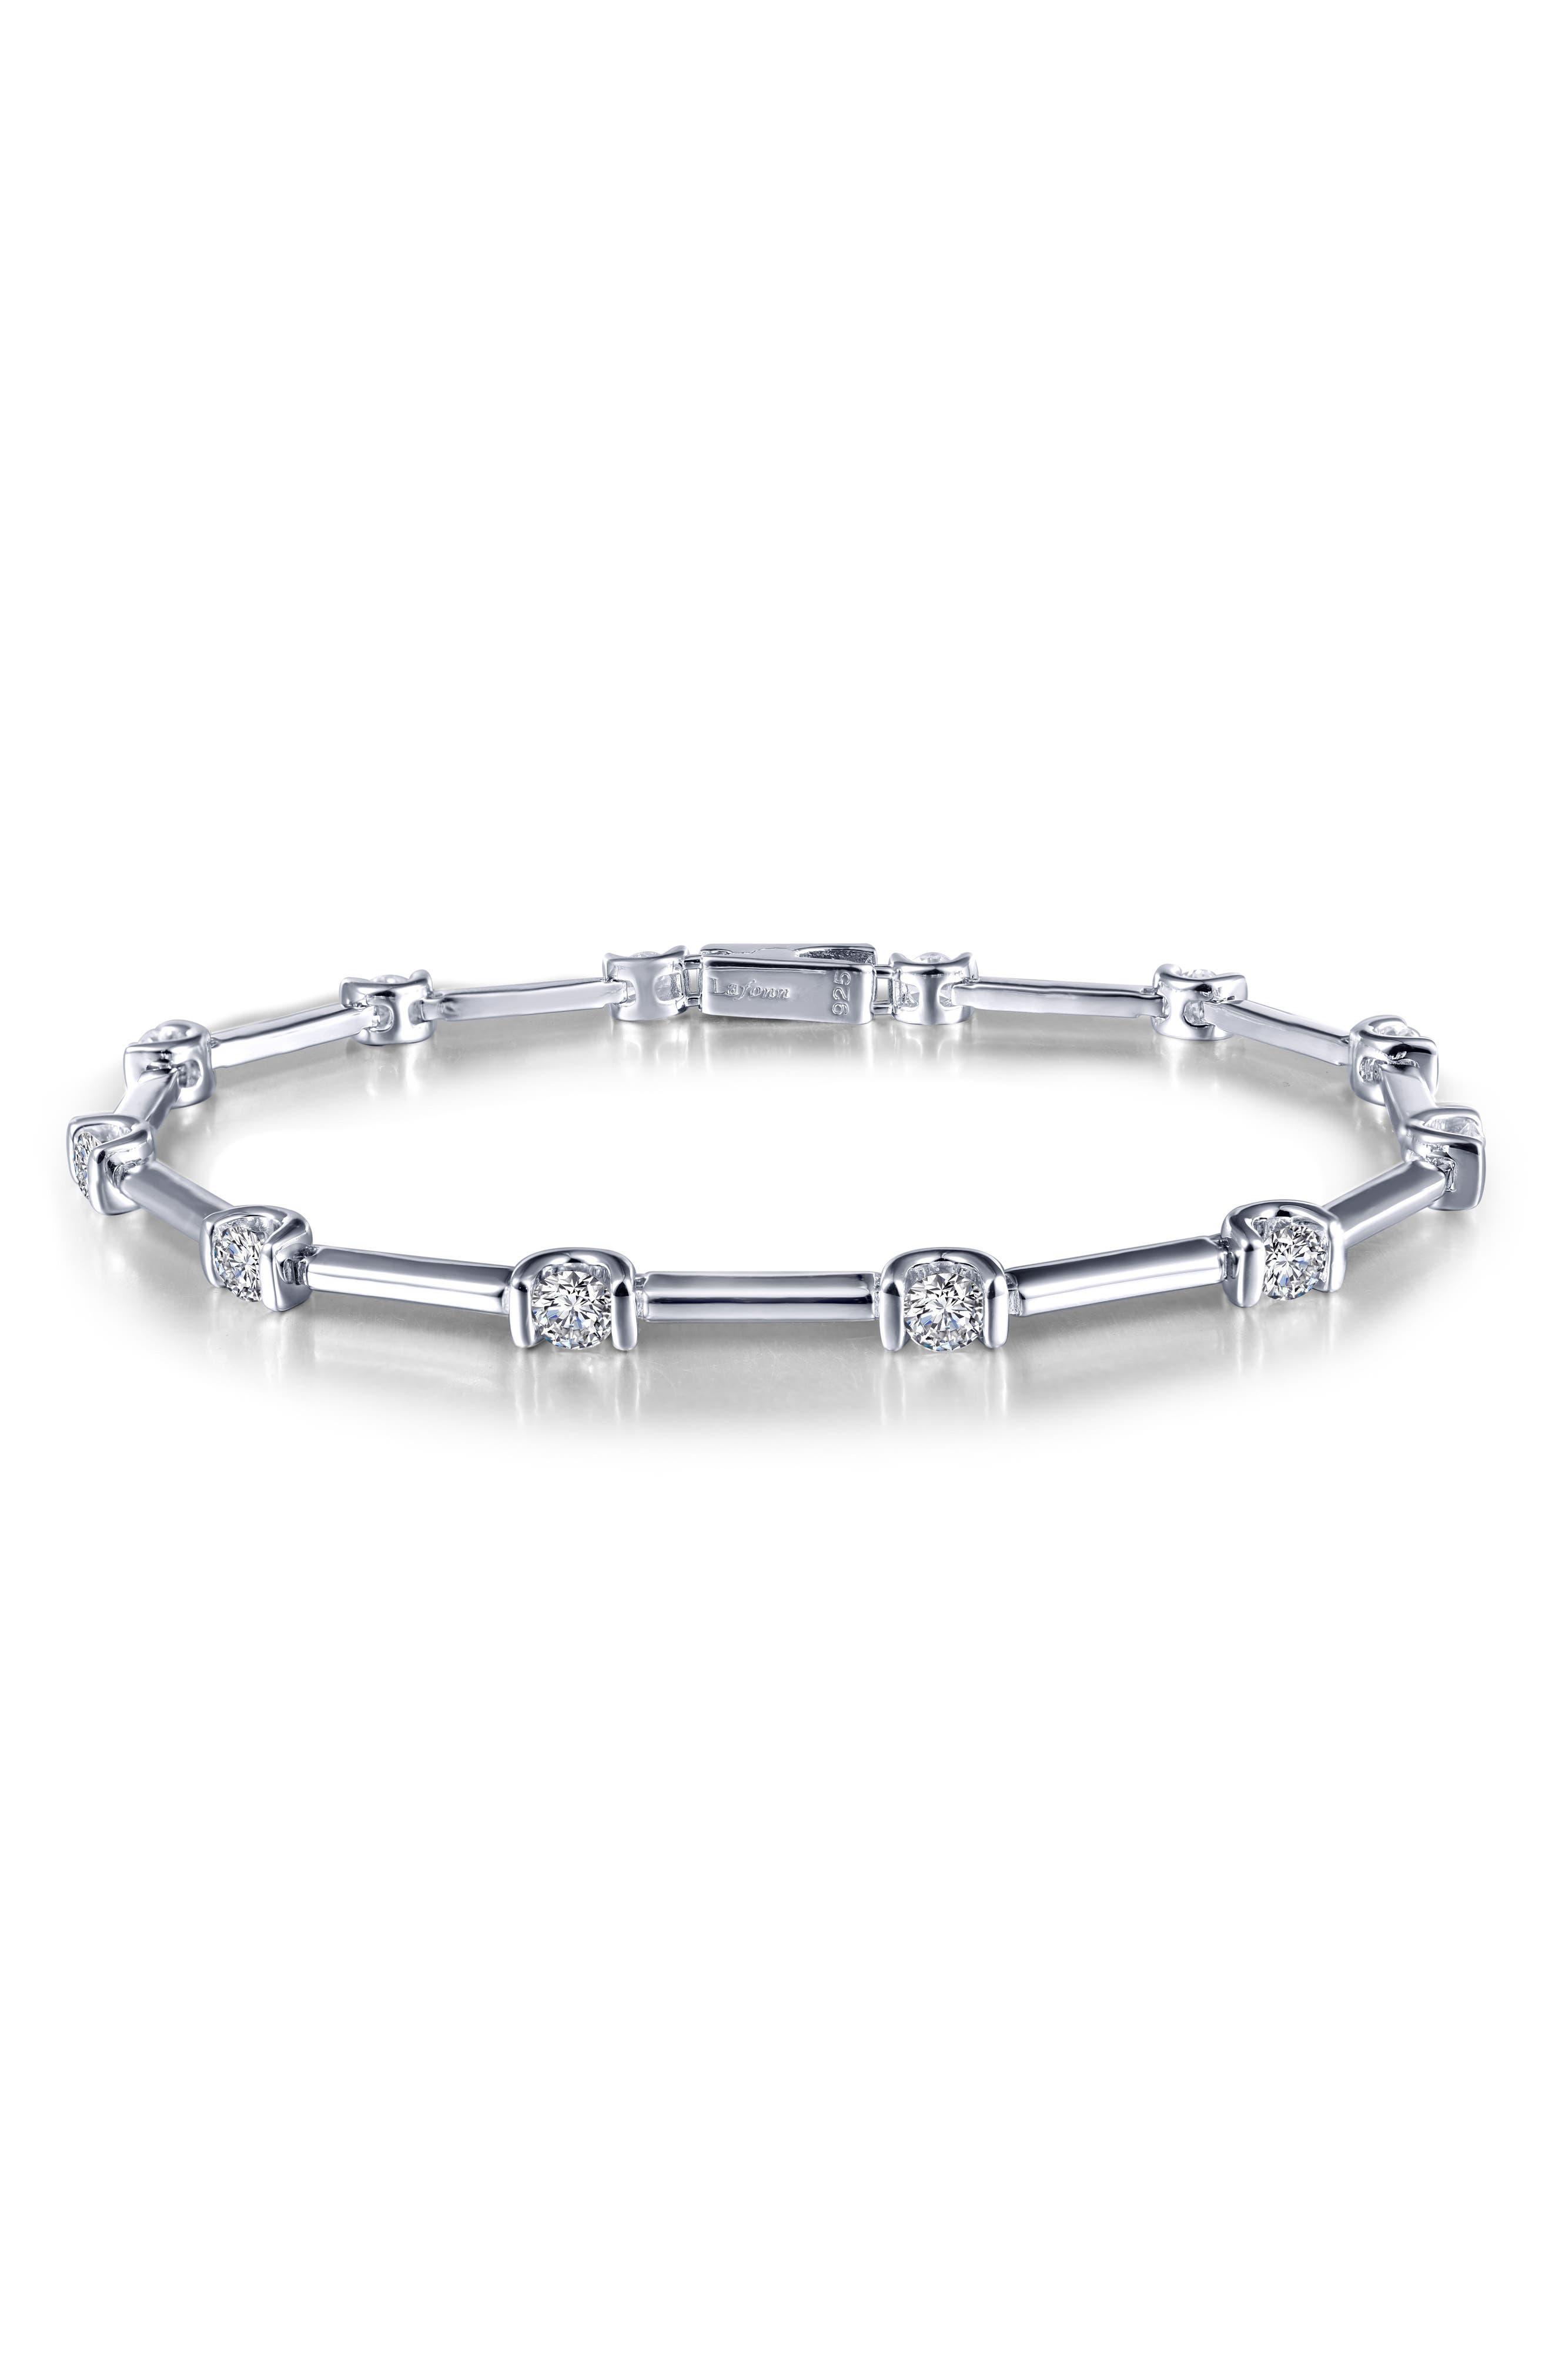 Simulated Diamond Bracelet,                             Main thumbnail 1, color,                             Silver/ Clear